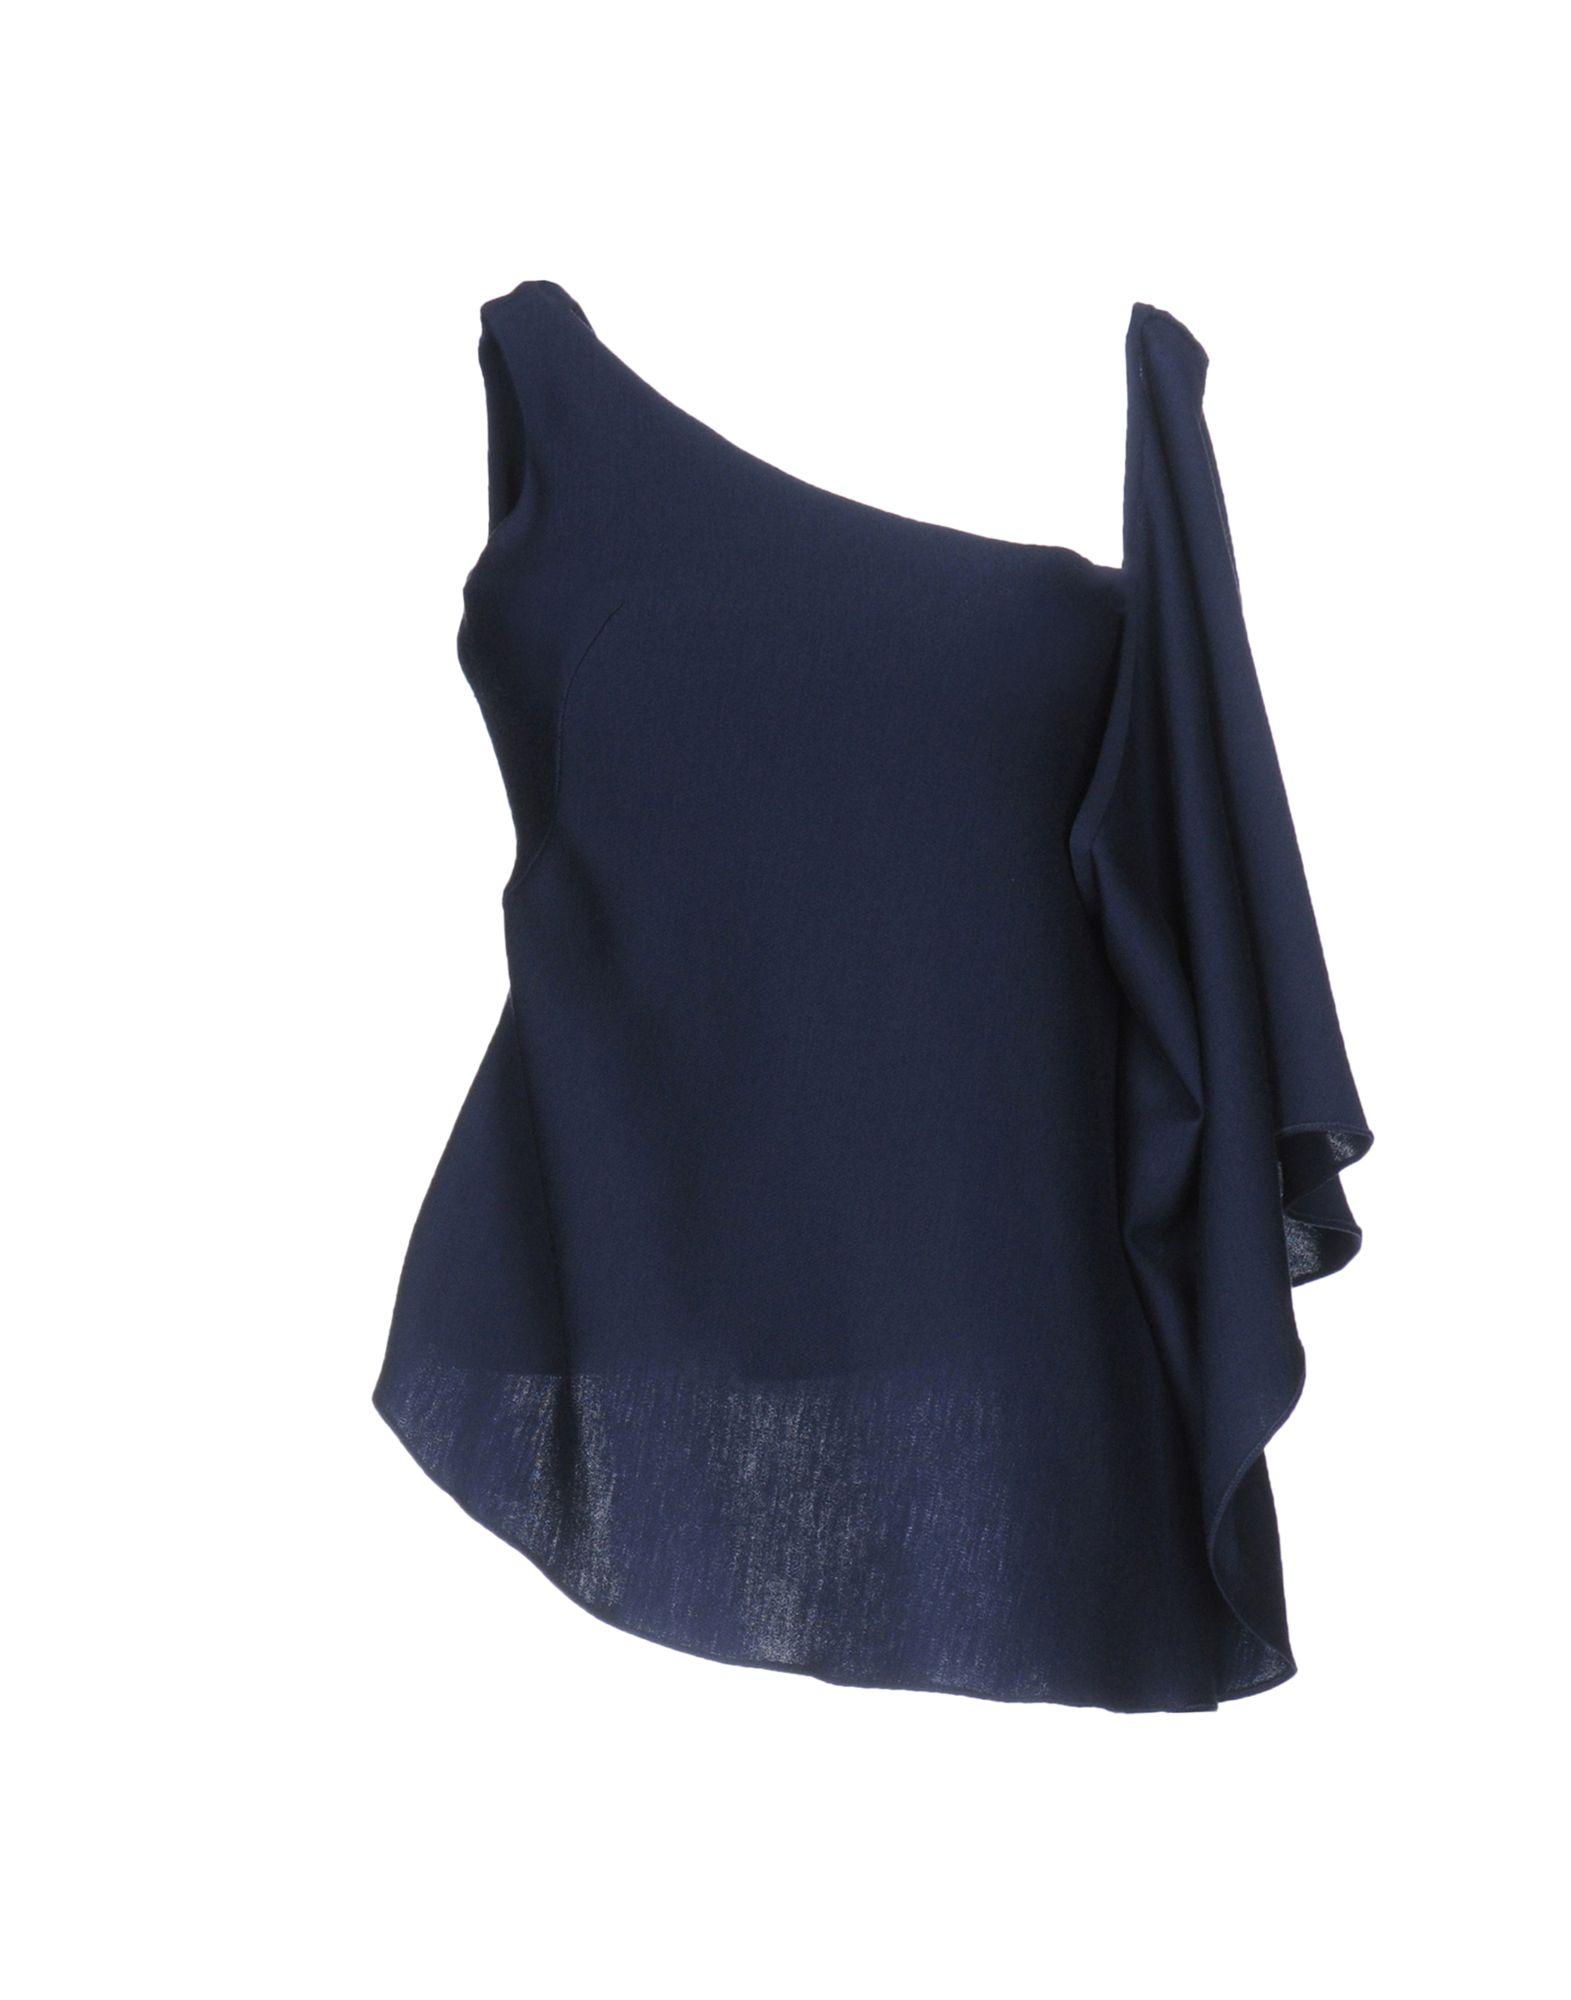 SYBILLA Sweater in Dark Blue